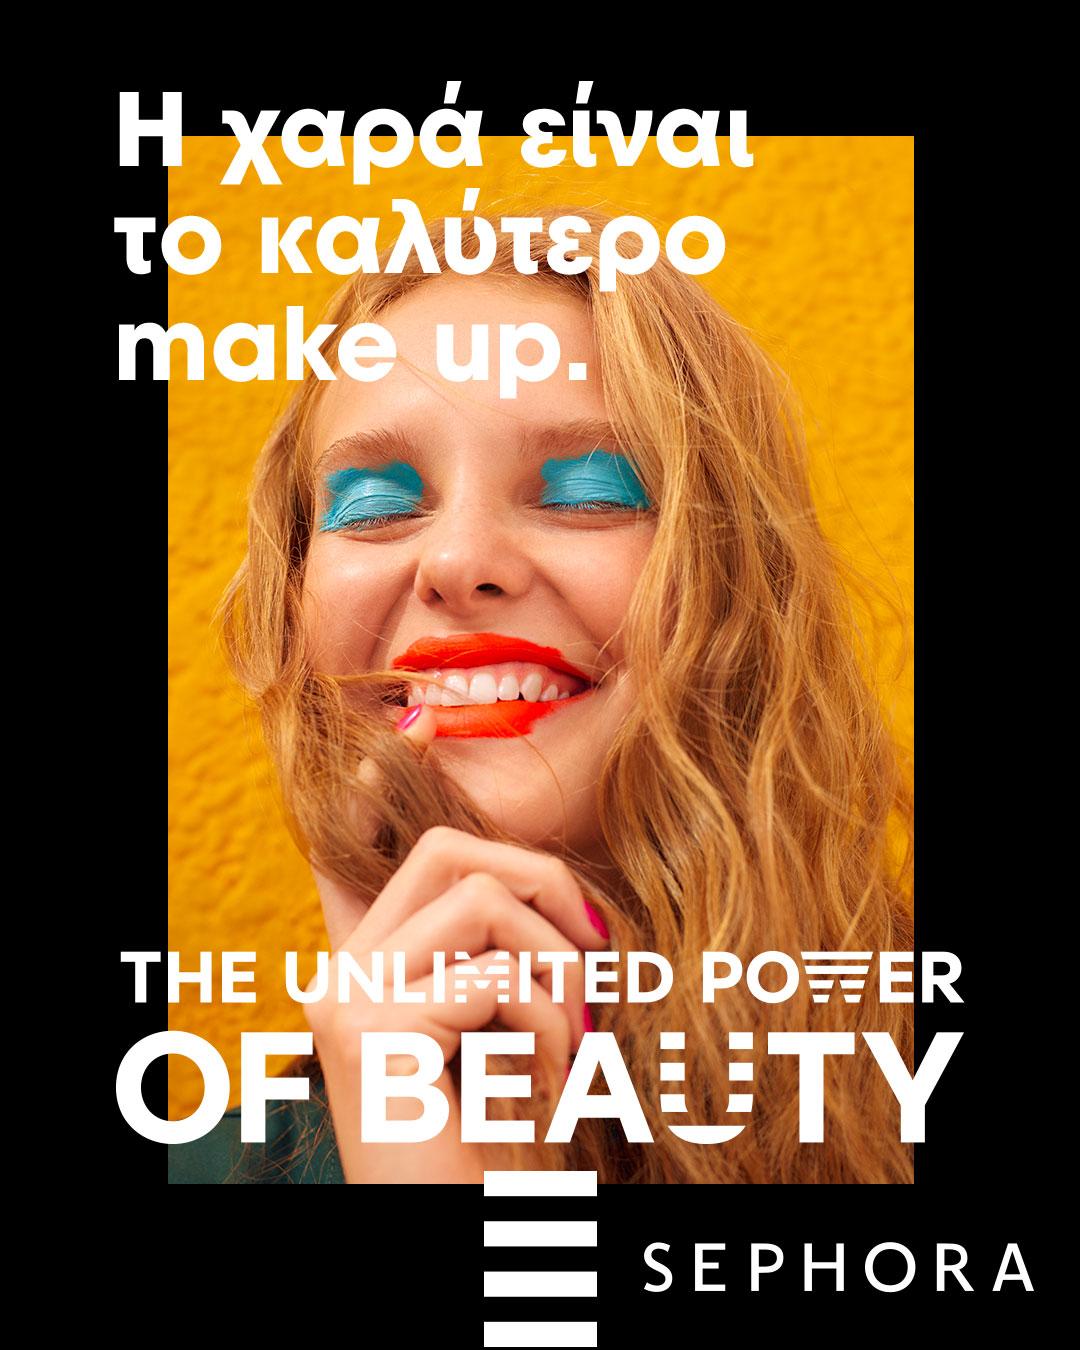 Wear joy as make up